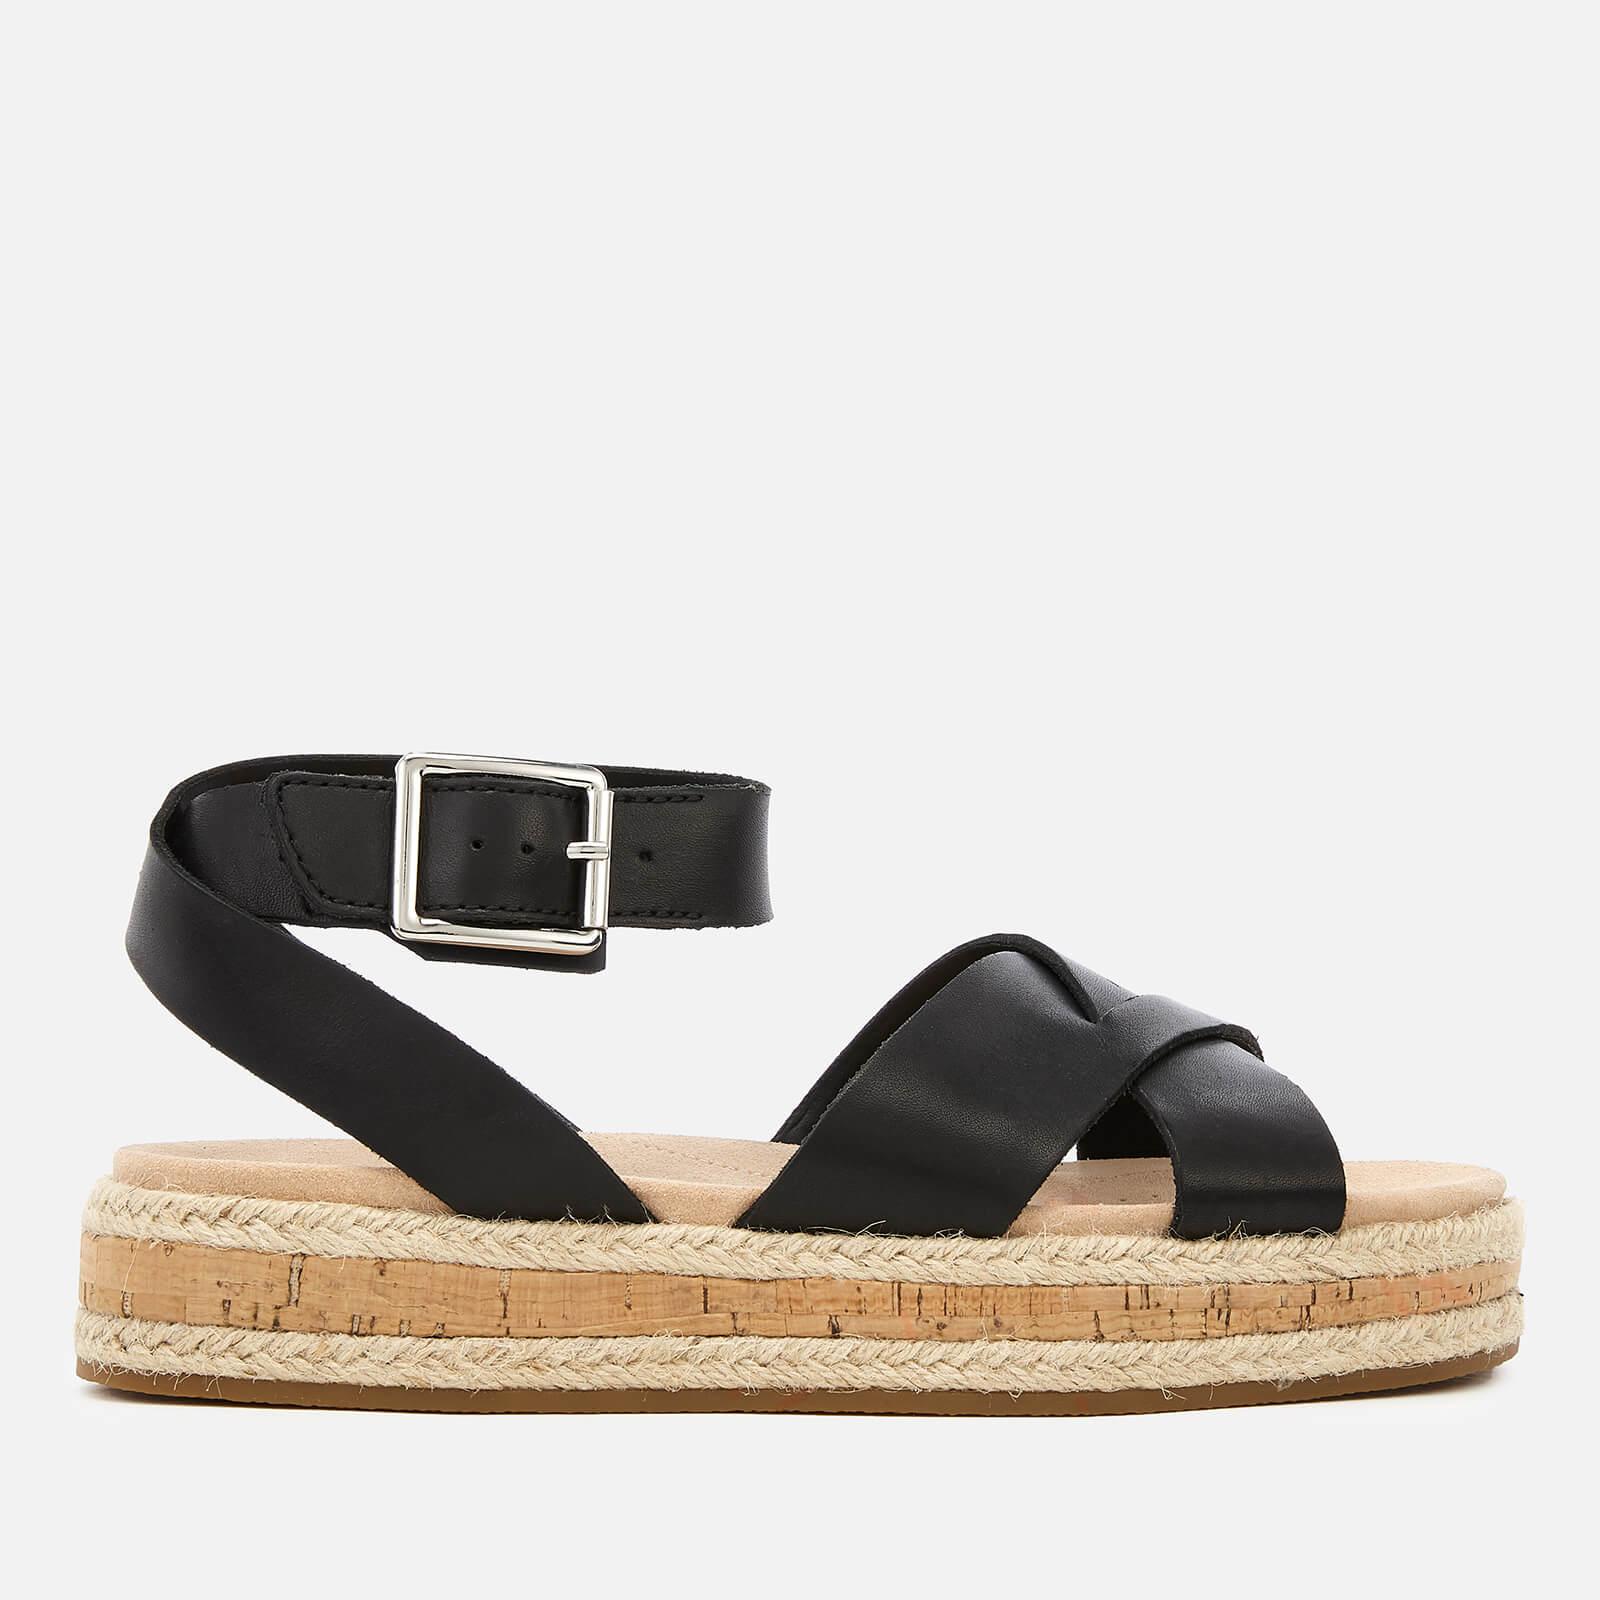 d1e58296c42 Clarks Women s Botanic Poppy Leather Flatform Sandals - Black Womens  Accessories